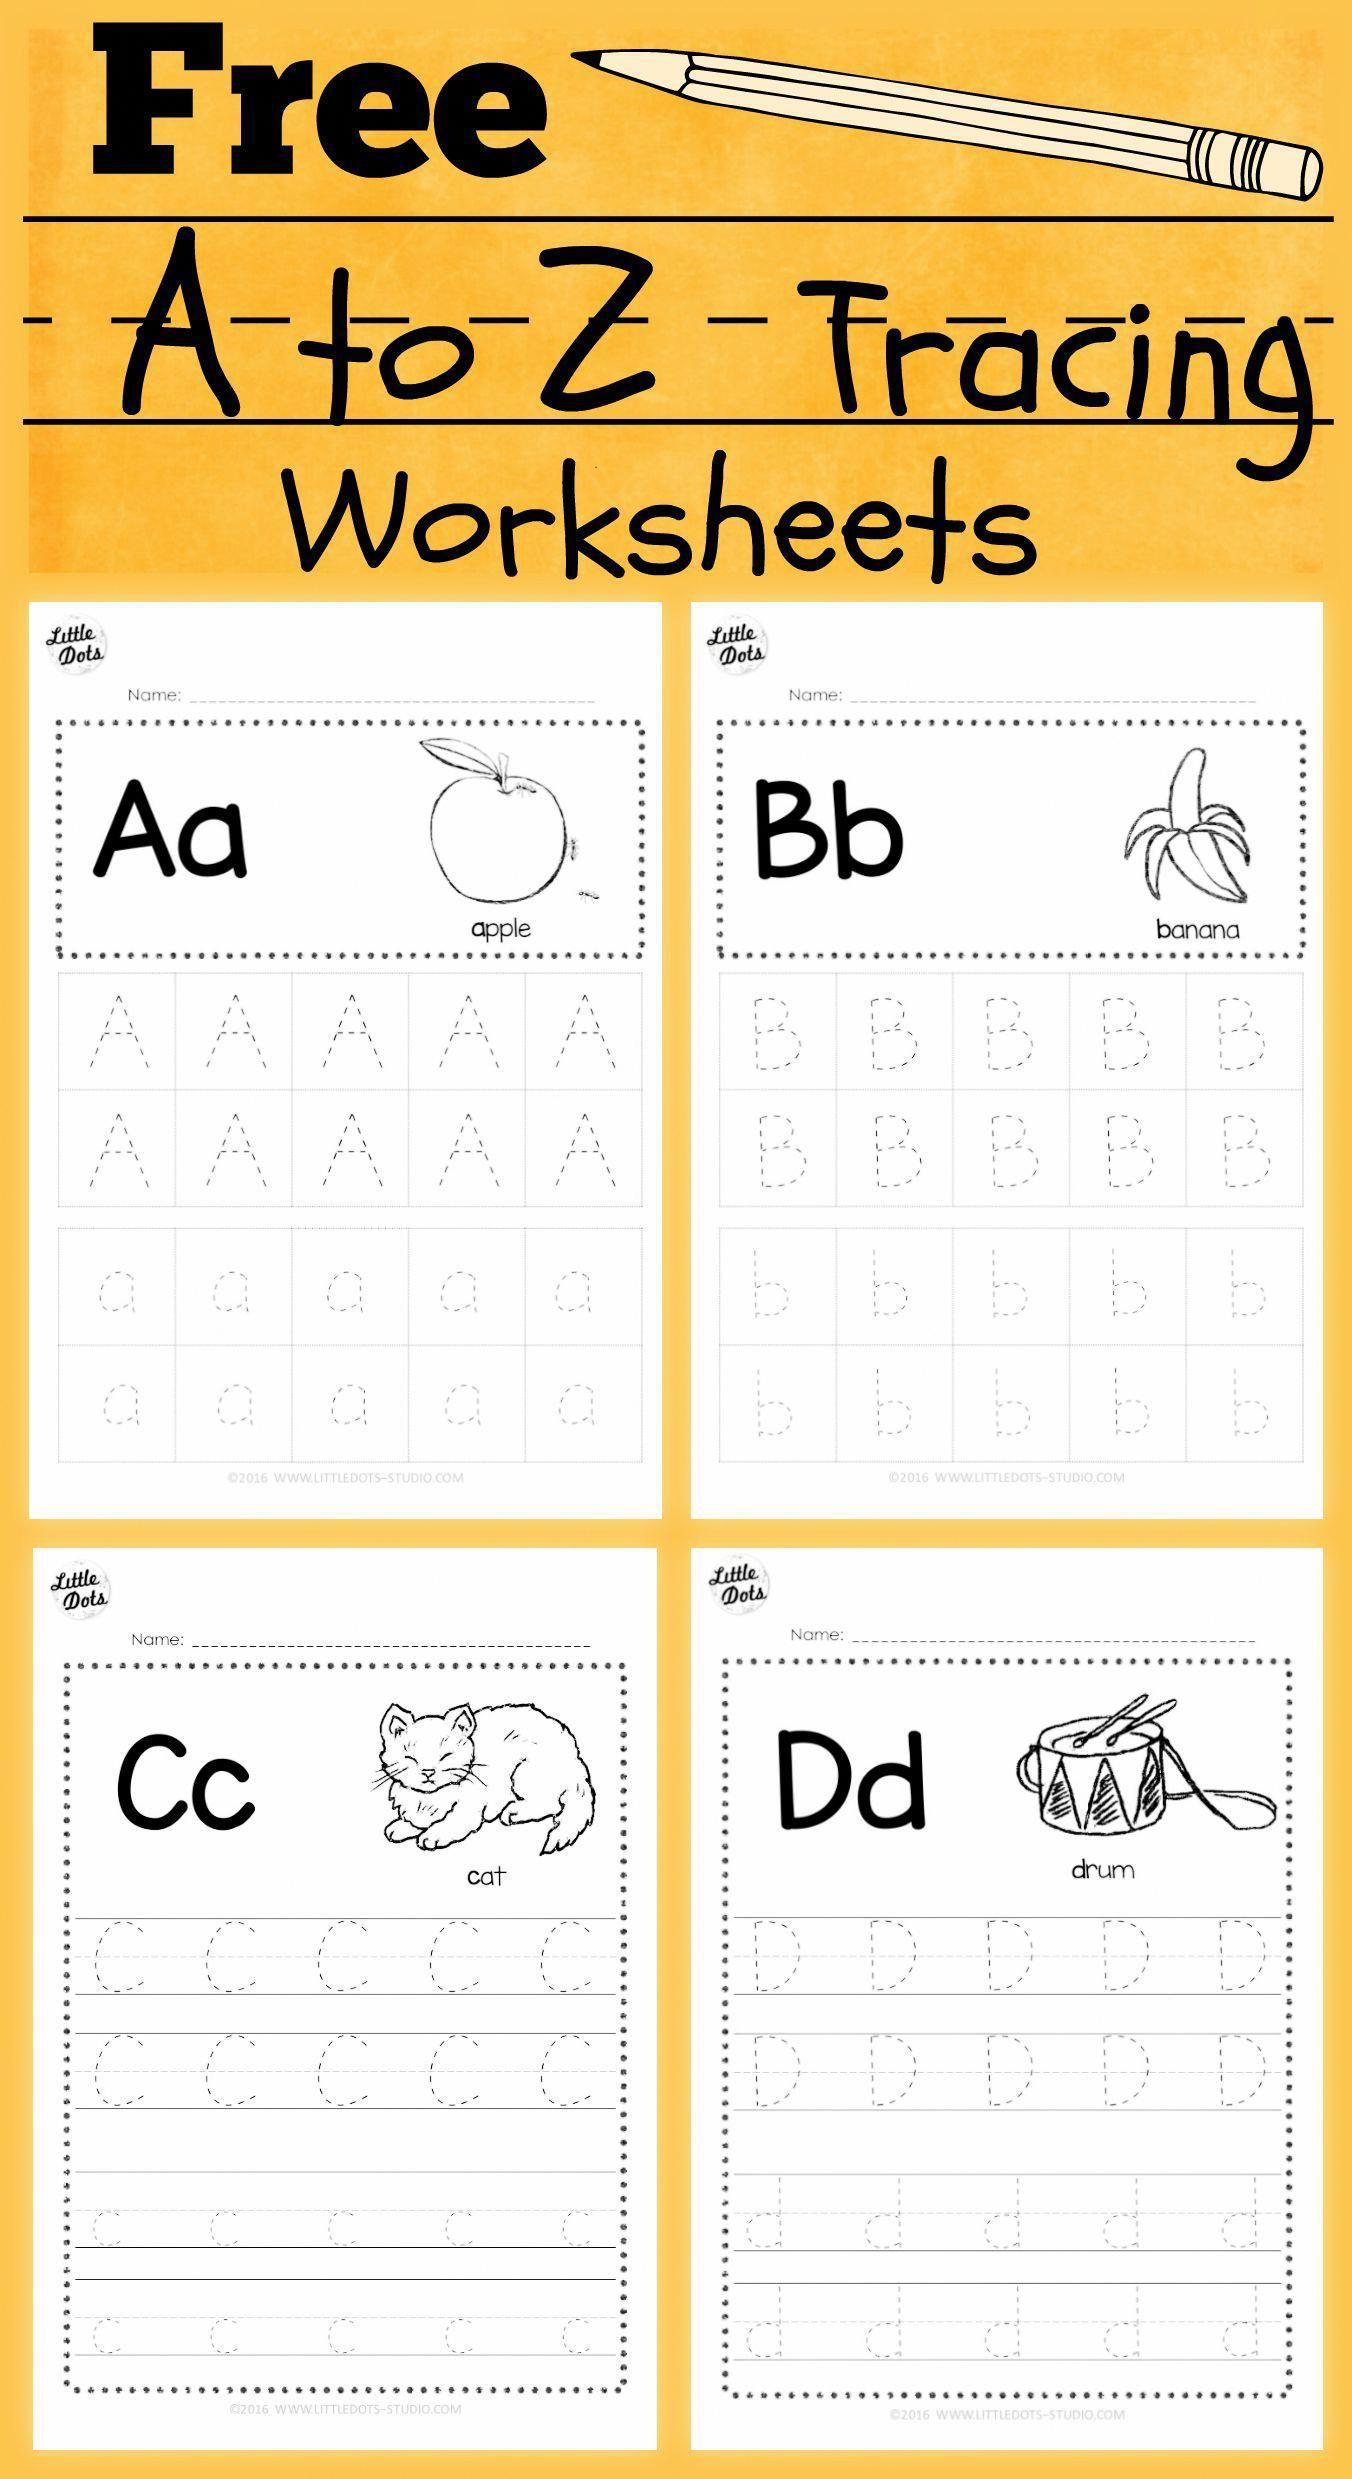 3dprintingvideosarchitecturemodel Homeschool Printables Worksheets For Kids Code 235064 Alphabet Activities Preschool Preschool Writing Preschool Worksheets [ 2479 x 1352 Pixel ]